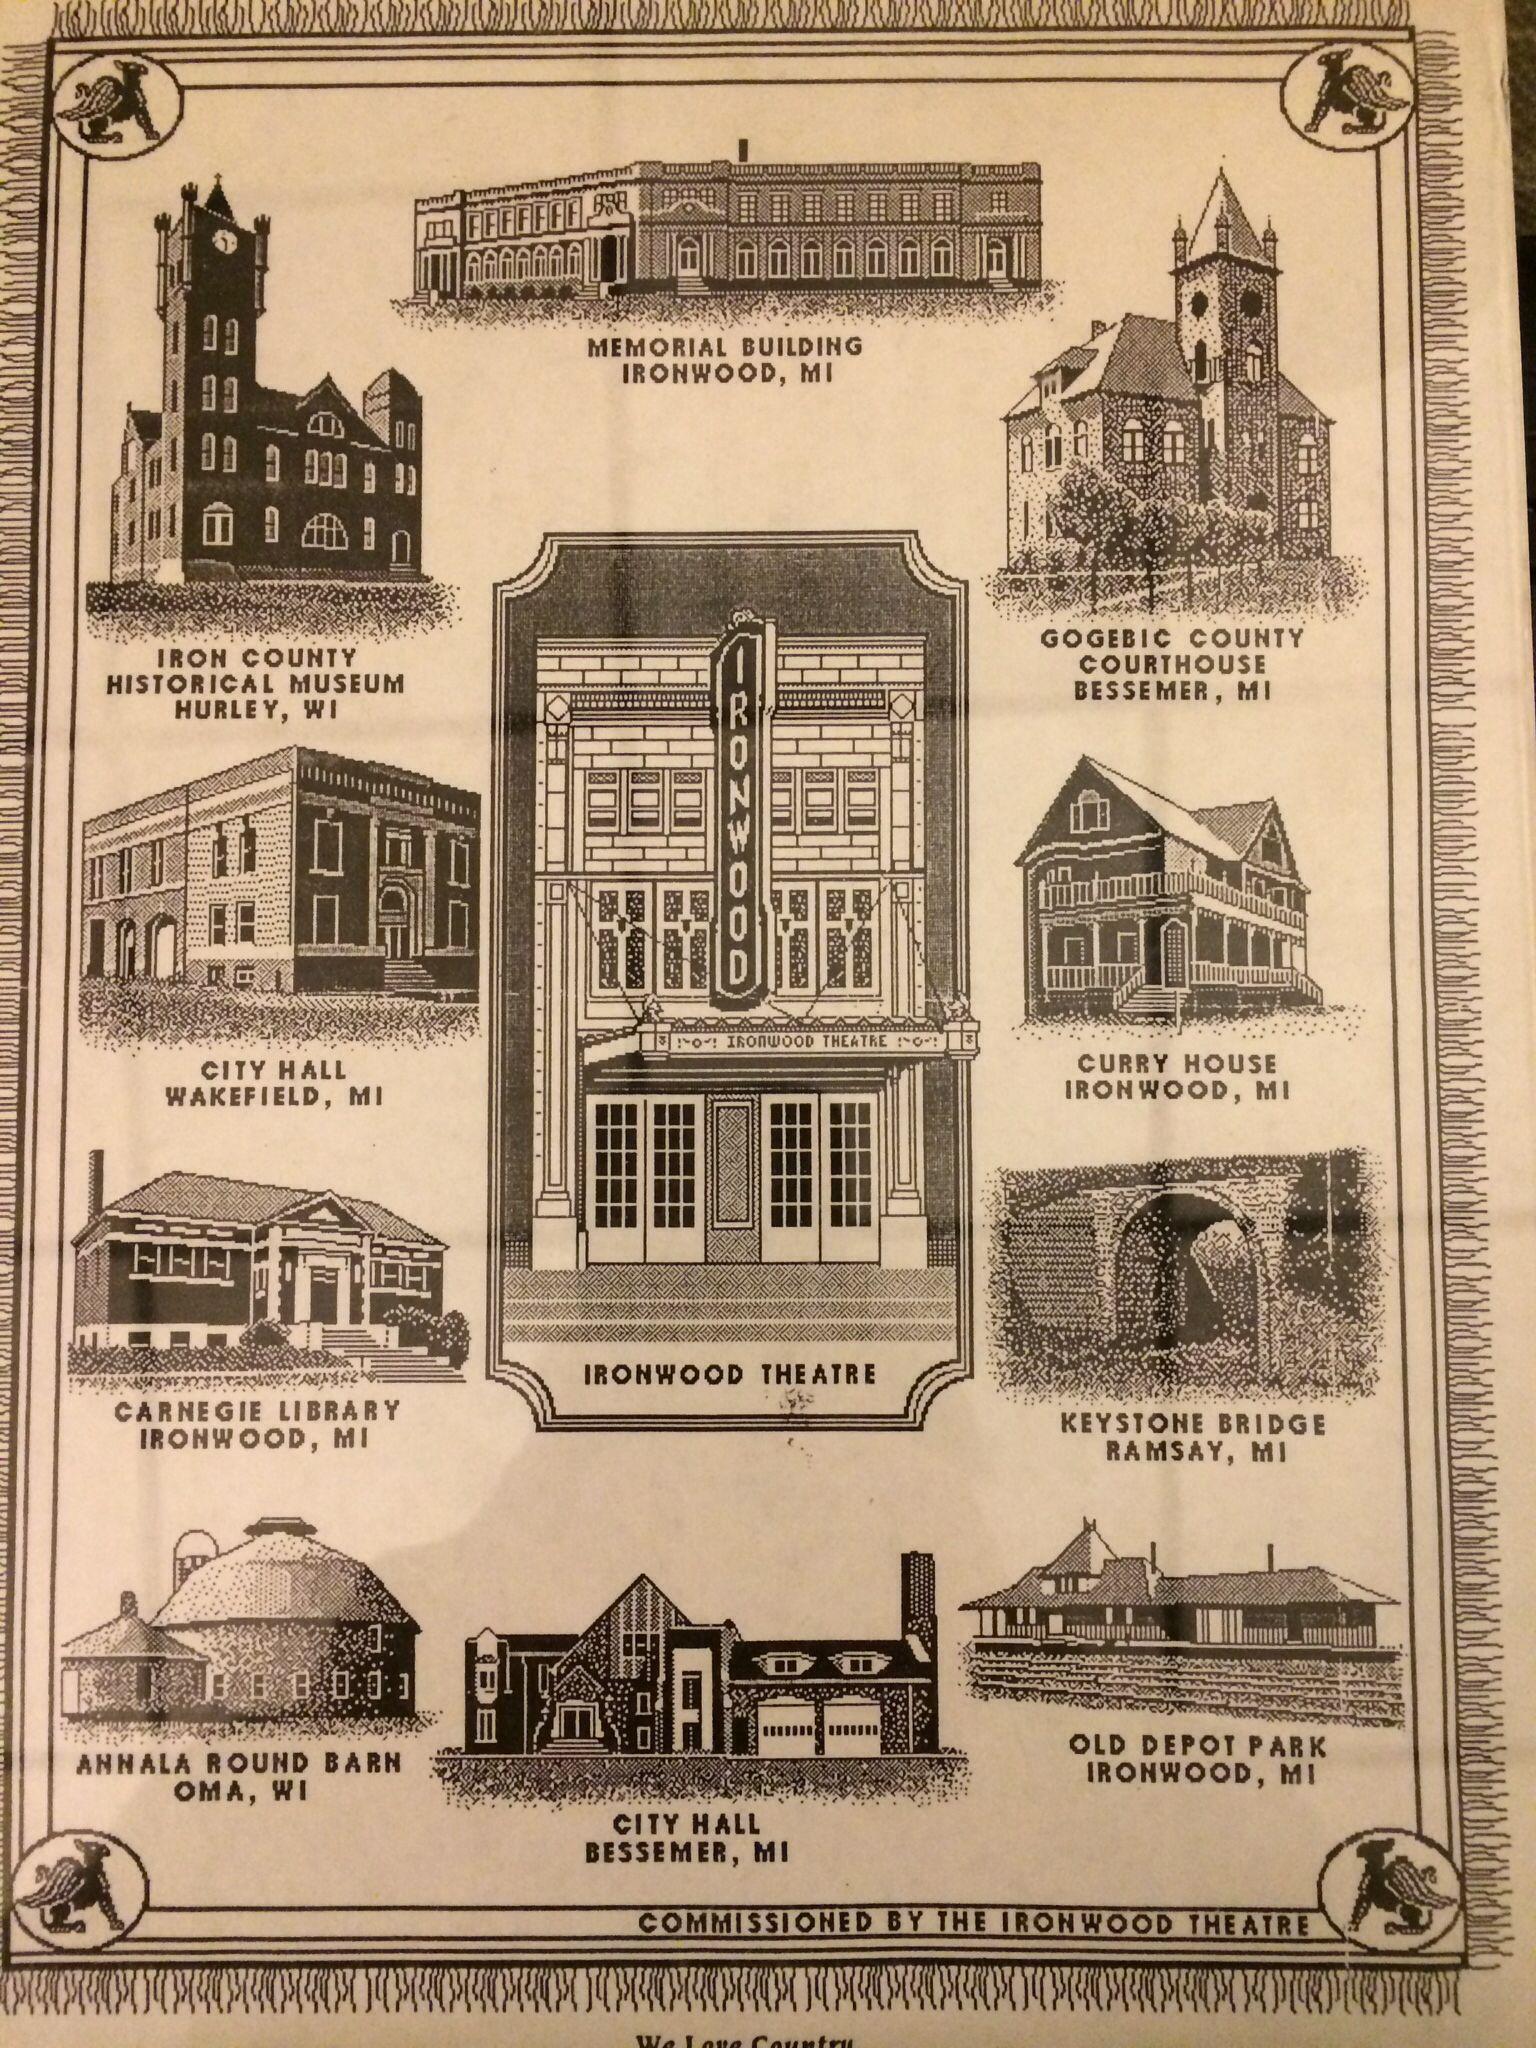 Ironwood Michigan Historic Buildings Ironwood Michigan Gogebic County Roadside Attractions